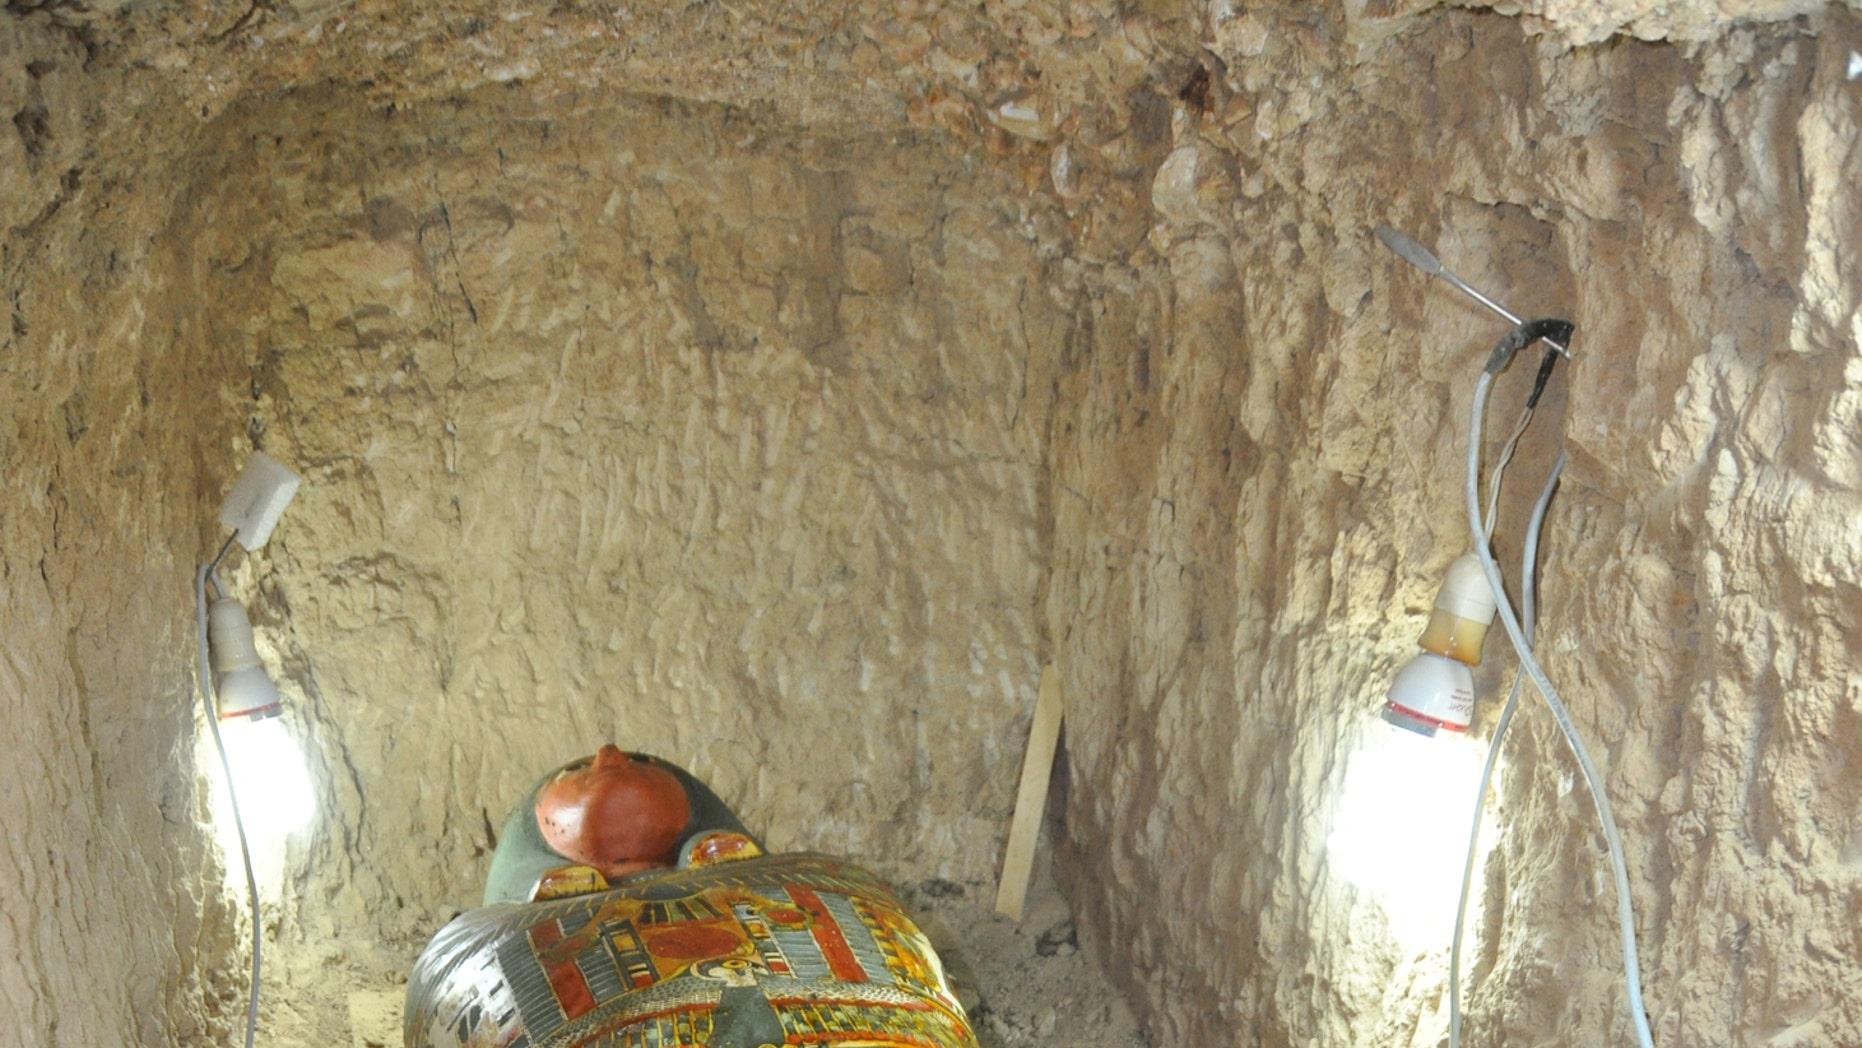 Image copyright Thutmosis III Tempel Project. (Courtesy of Dr. Myriam Seco Álvarez)